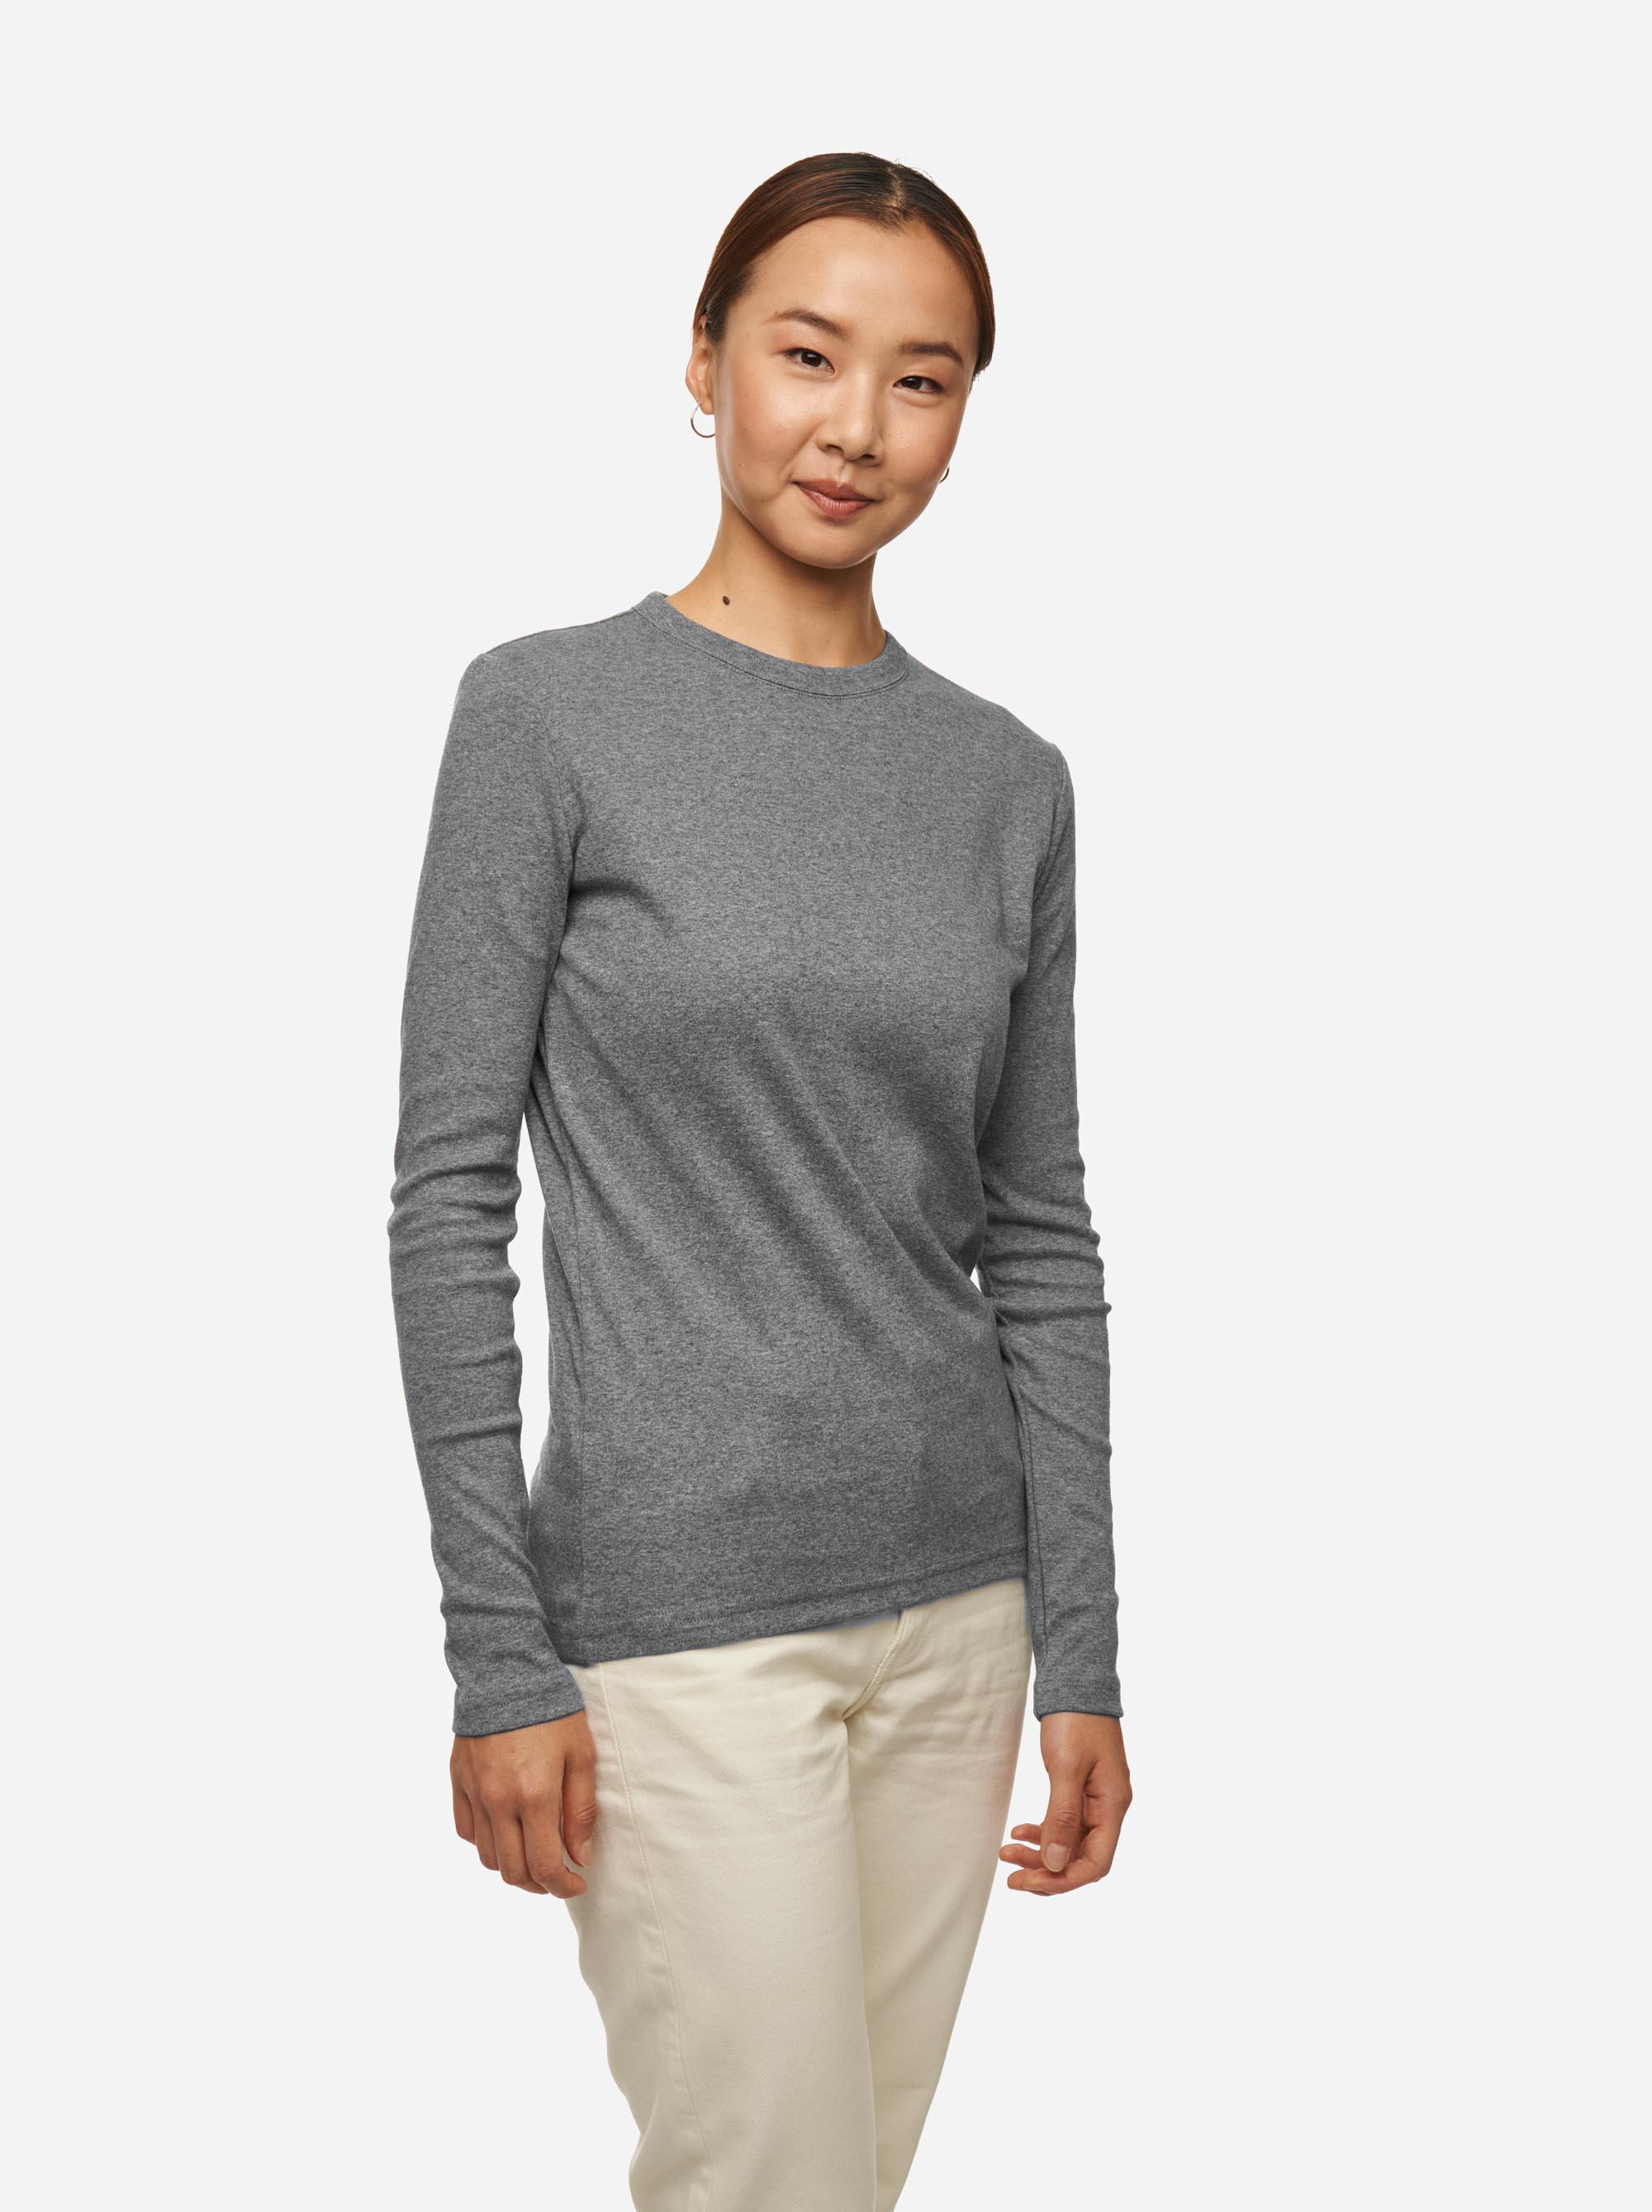 Teym - The-T-Shirt - Longsleeve - Women - Melange Grey - 2B